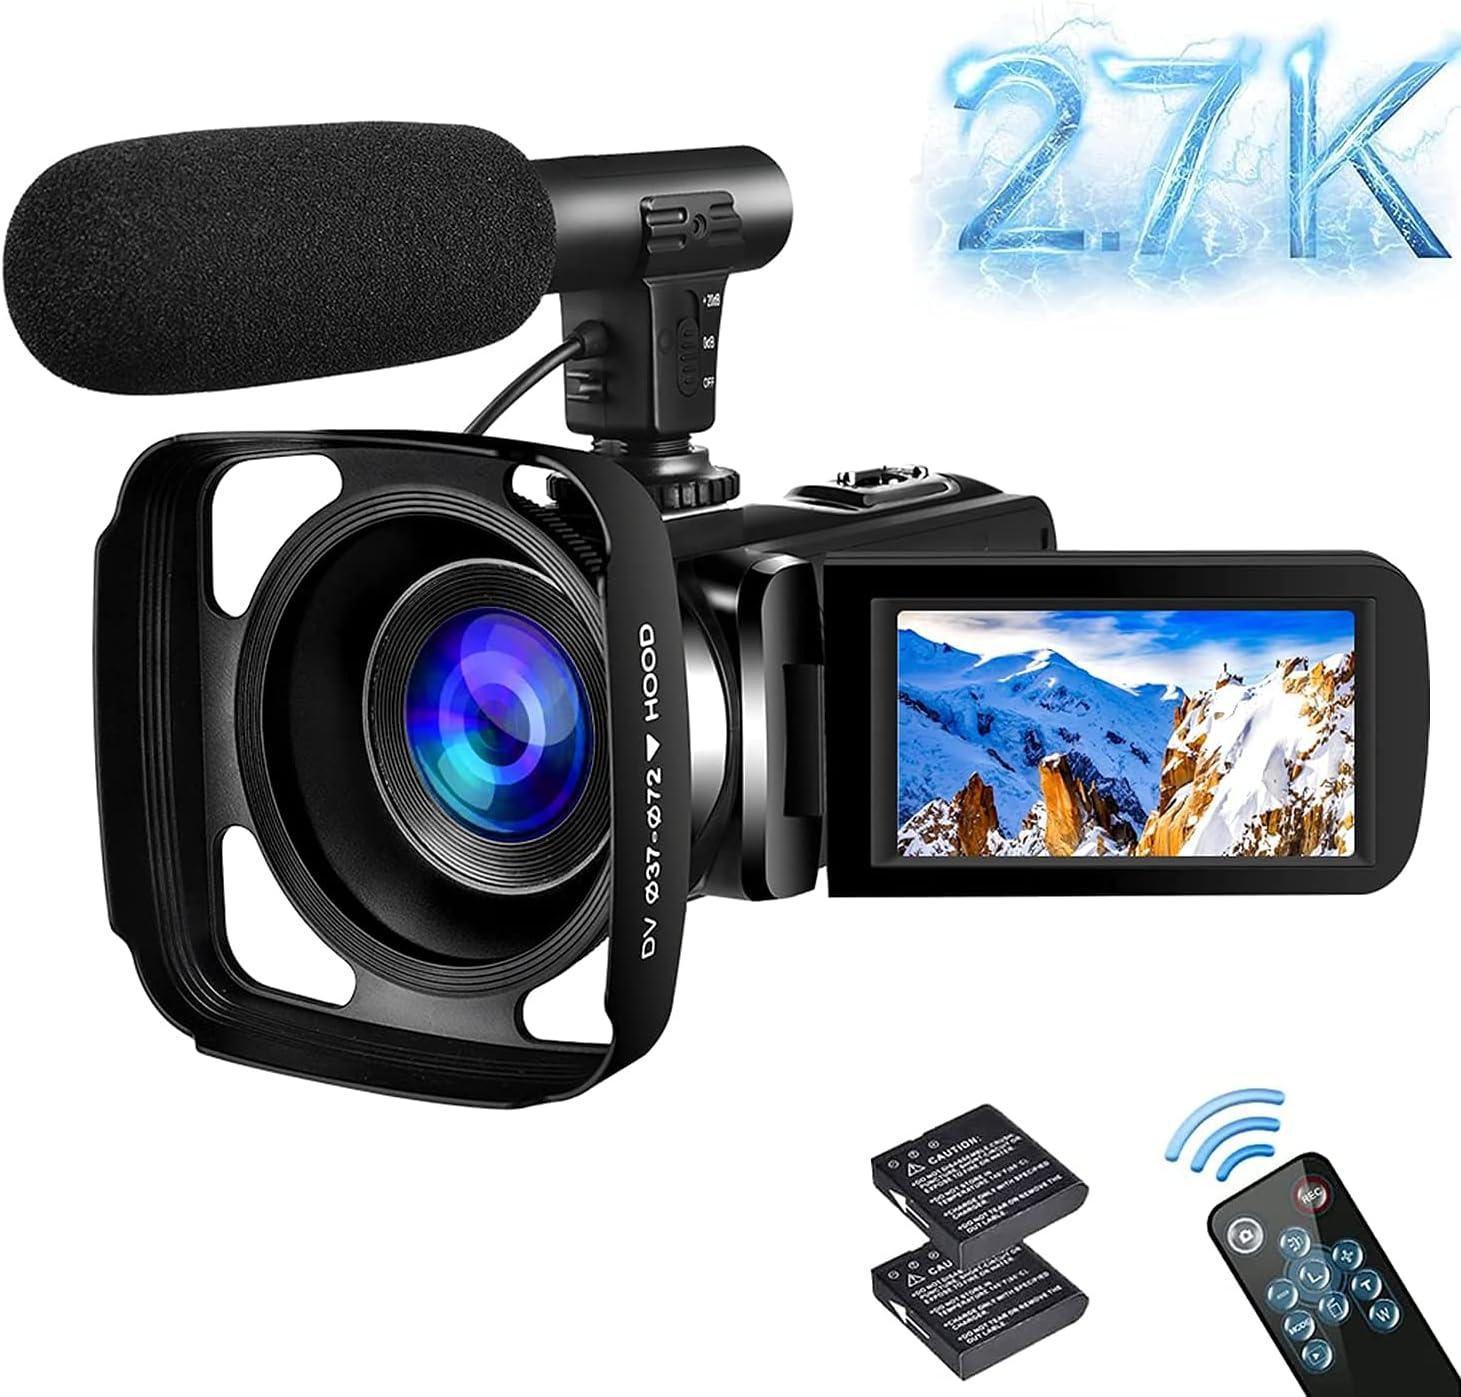 Sauleoo 30MP 2.7K HD  Digital Camcorder $39.99 Coupon